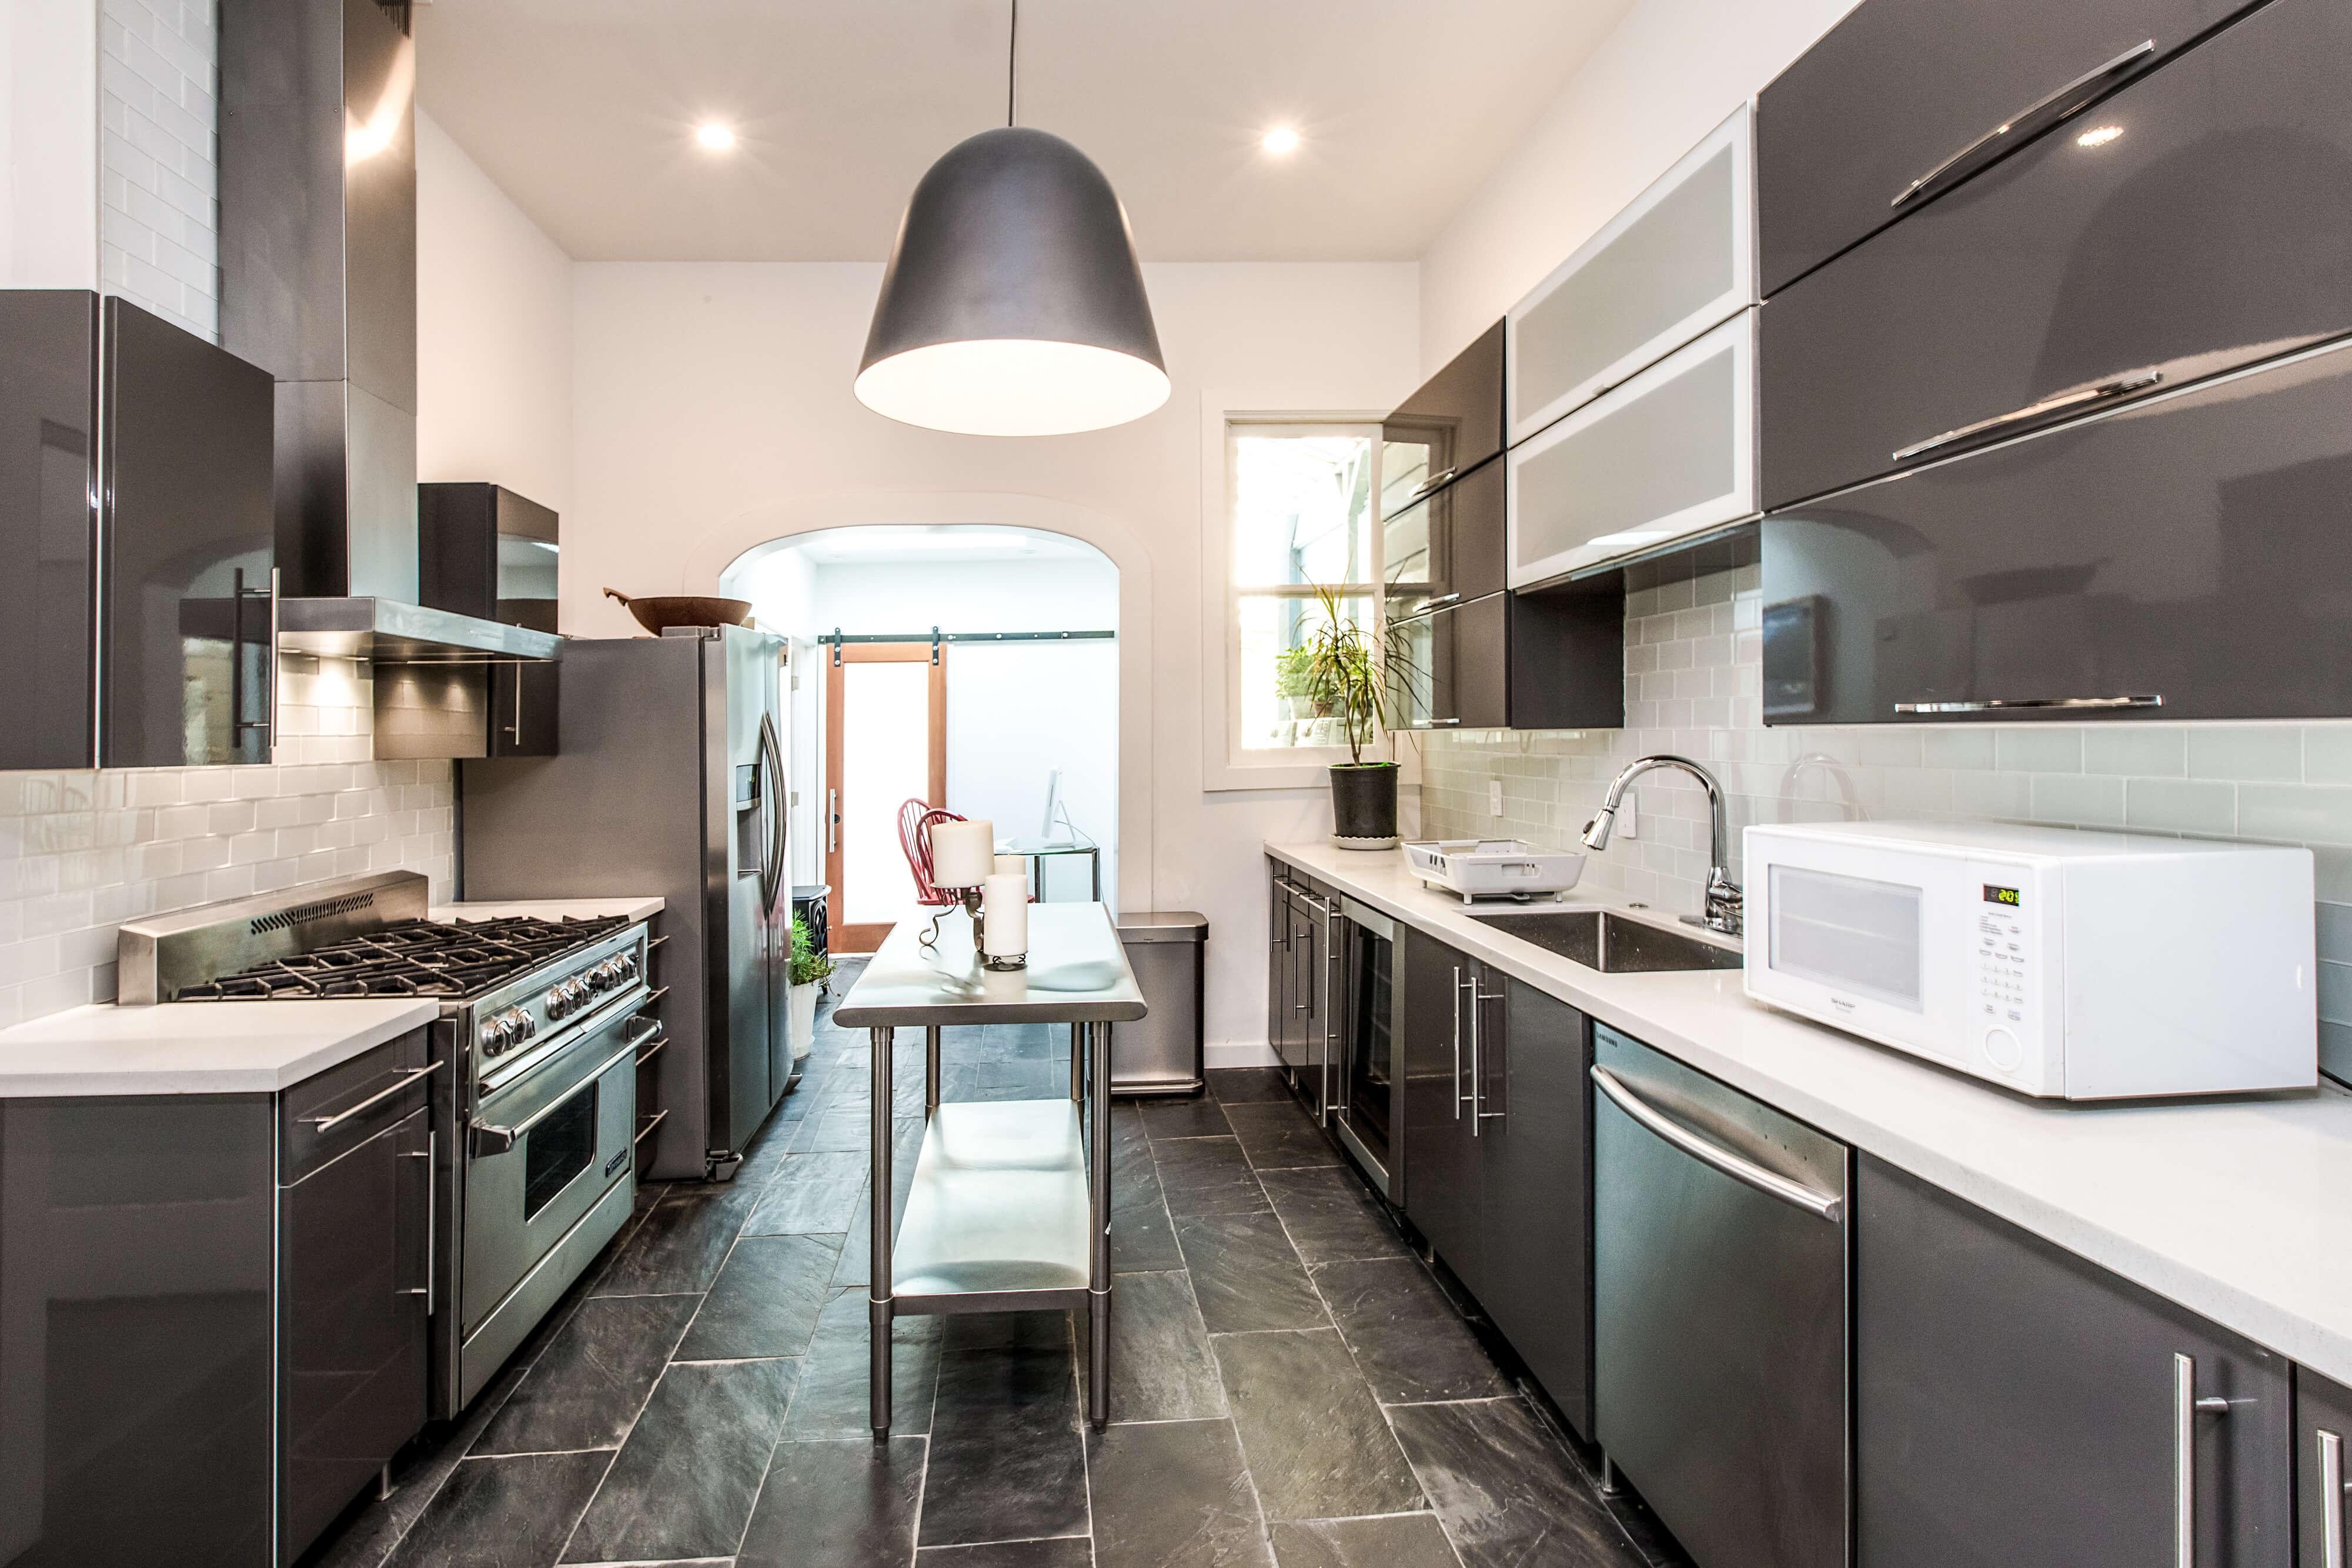 Kitchen Area - View 1